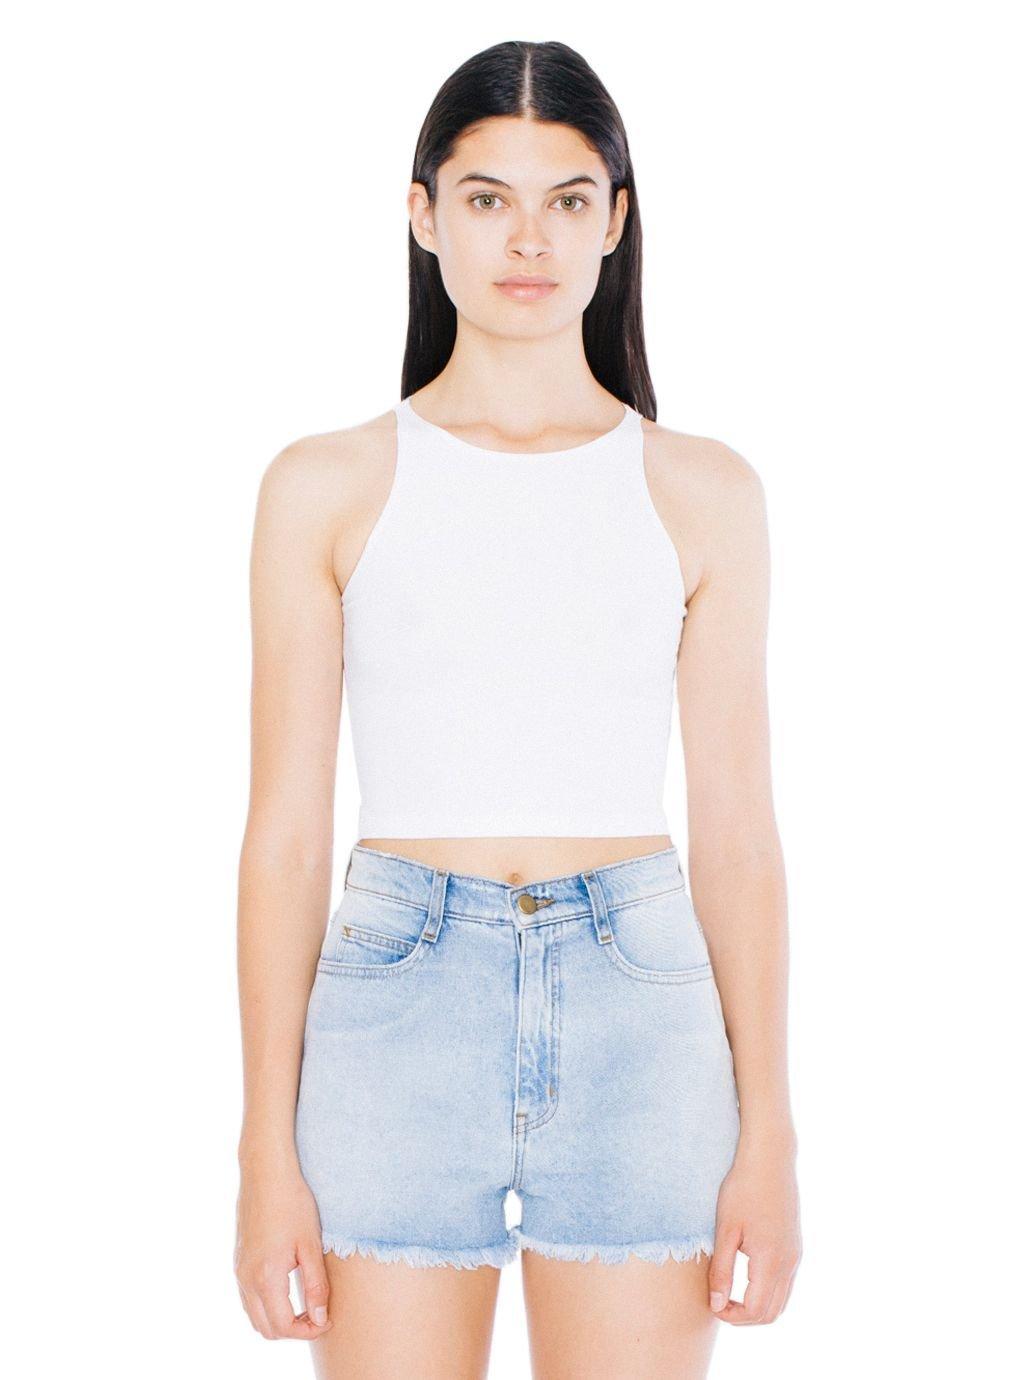 American Apparel Women's Cotton Spandex Sleeveless Crop Top, White, Small